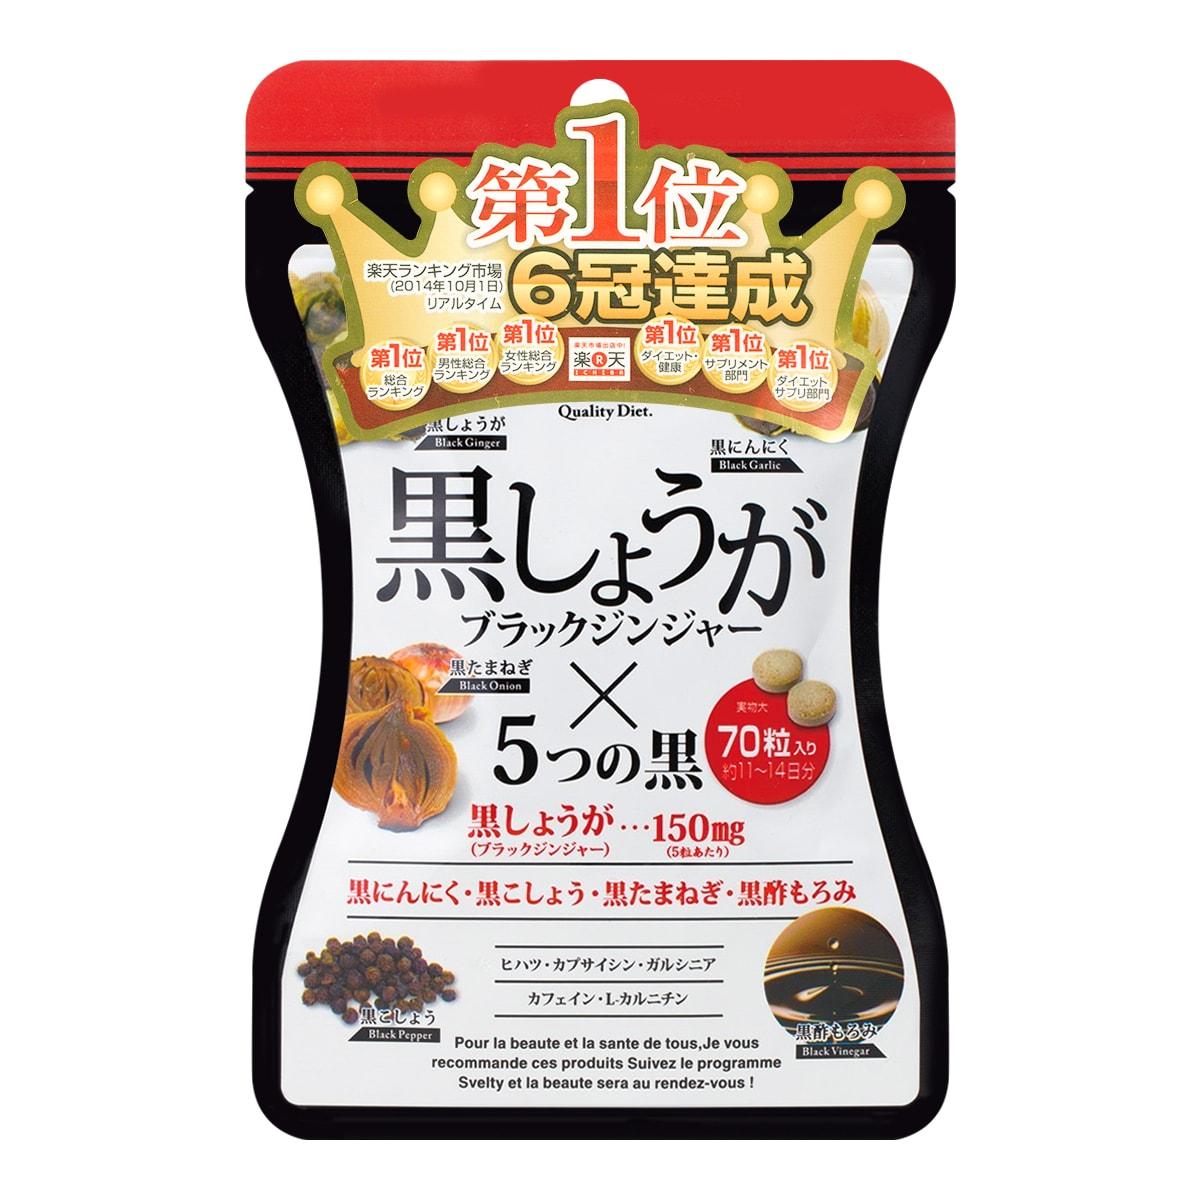 SVELTY Quality Diet Super Black Ginger